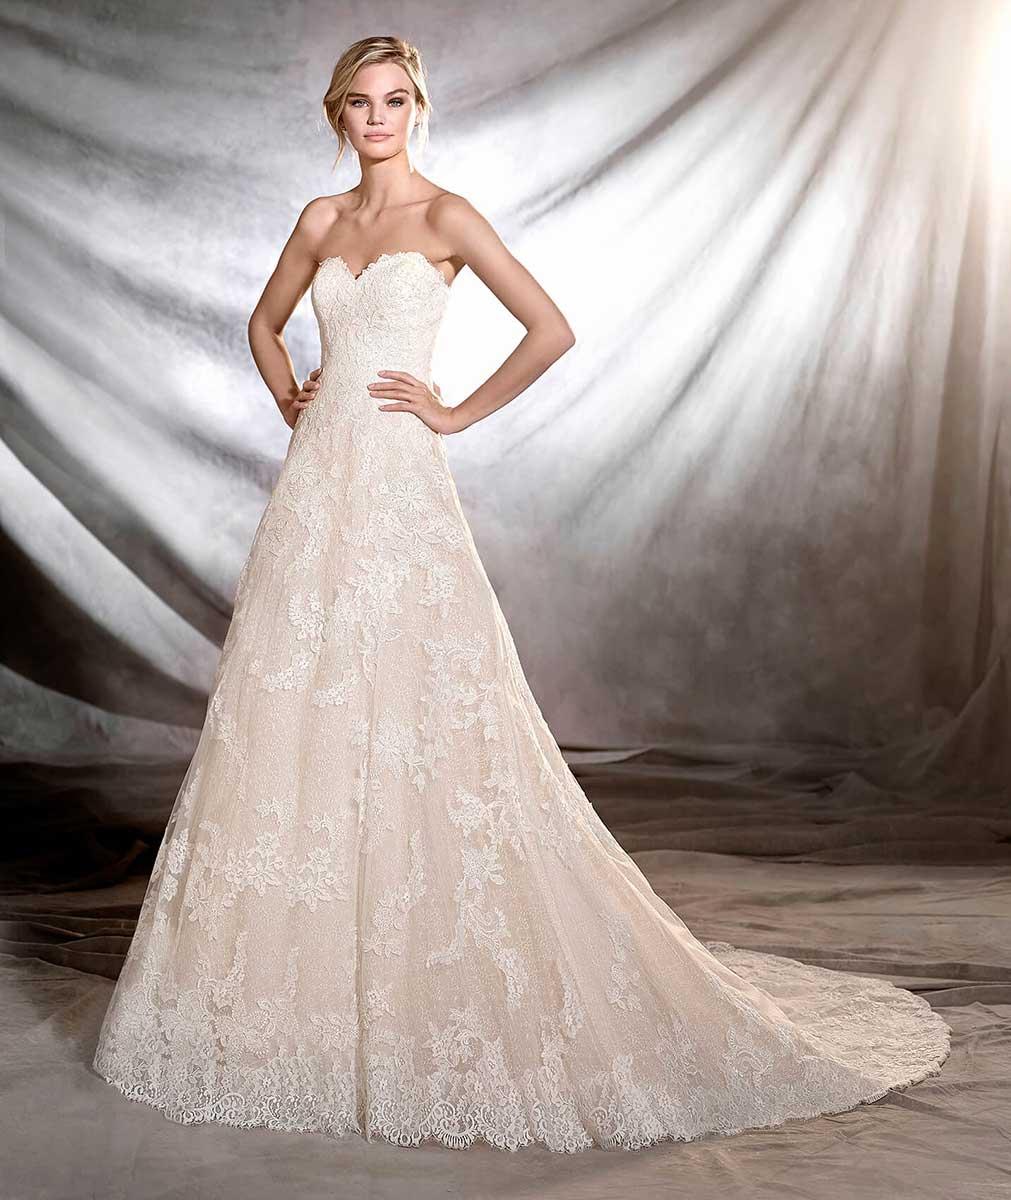 pronovias arlet wedding dress   mia sposa bridal boutique